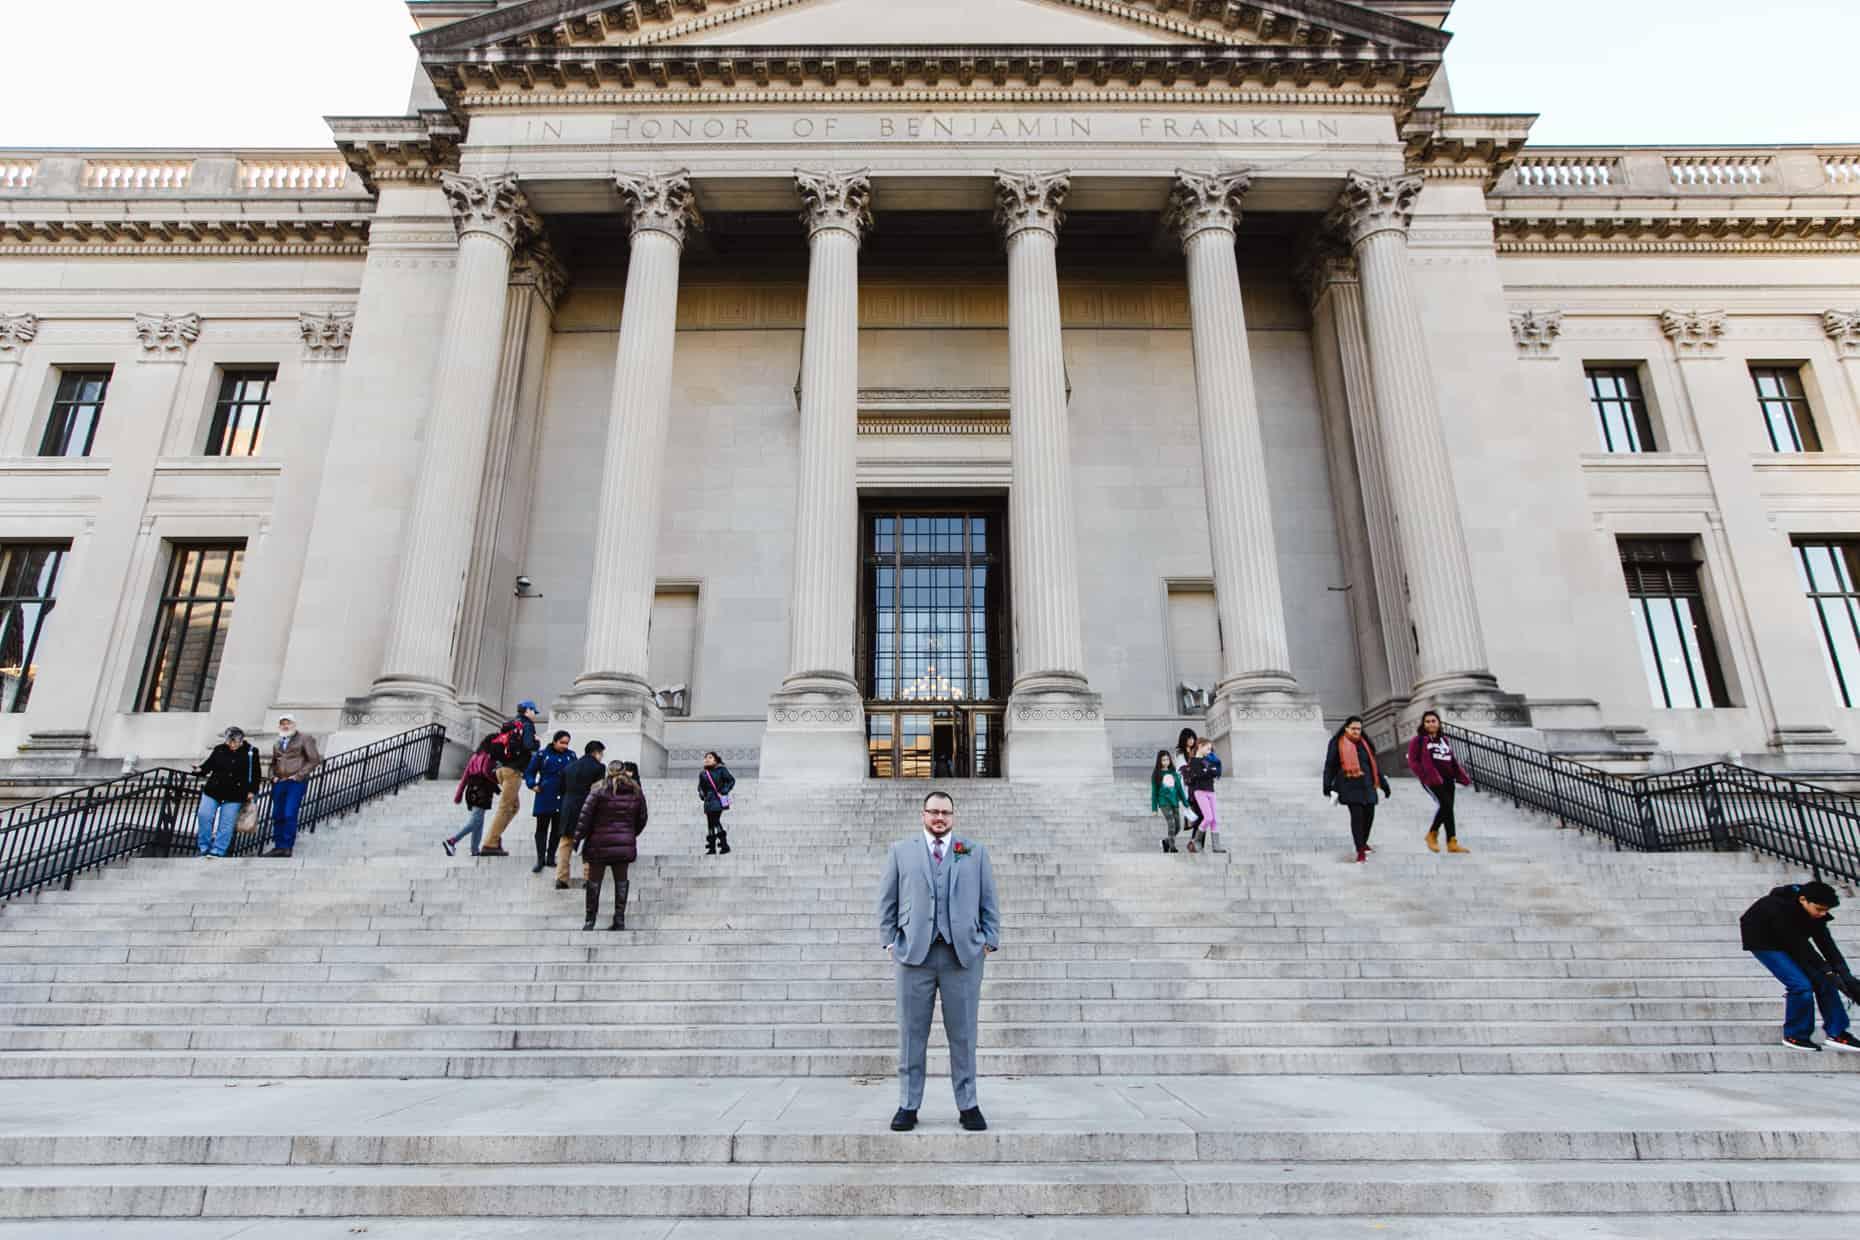 Franklin Institute Steps